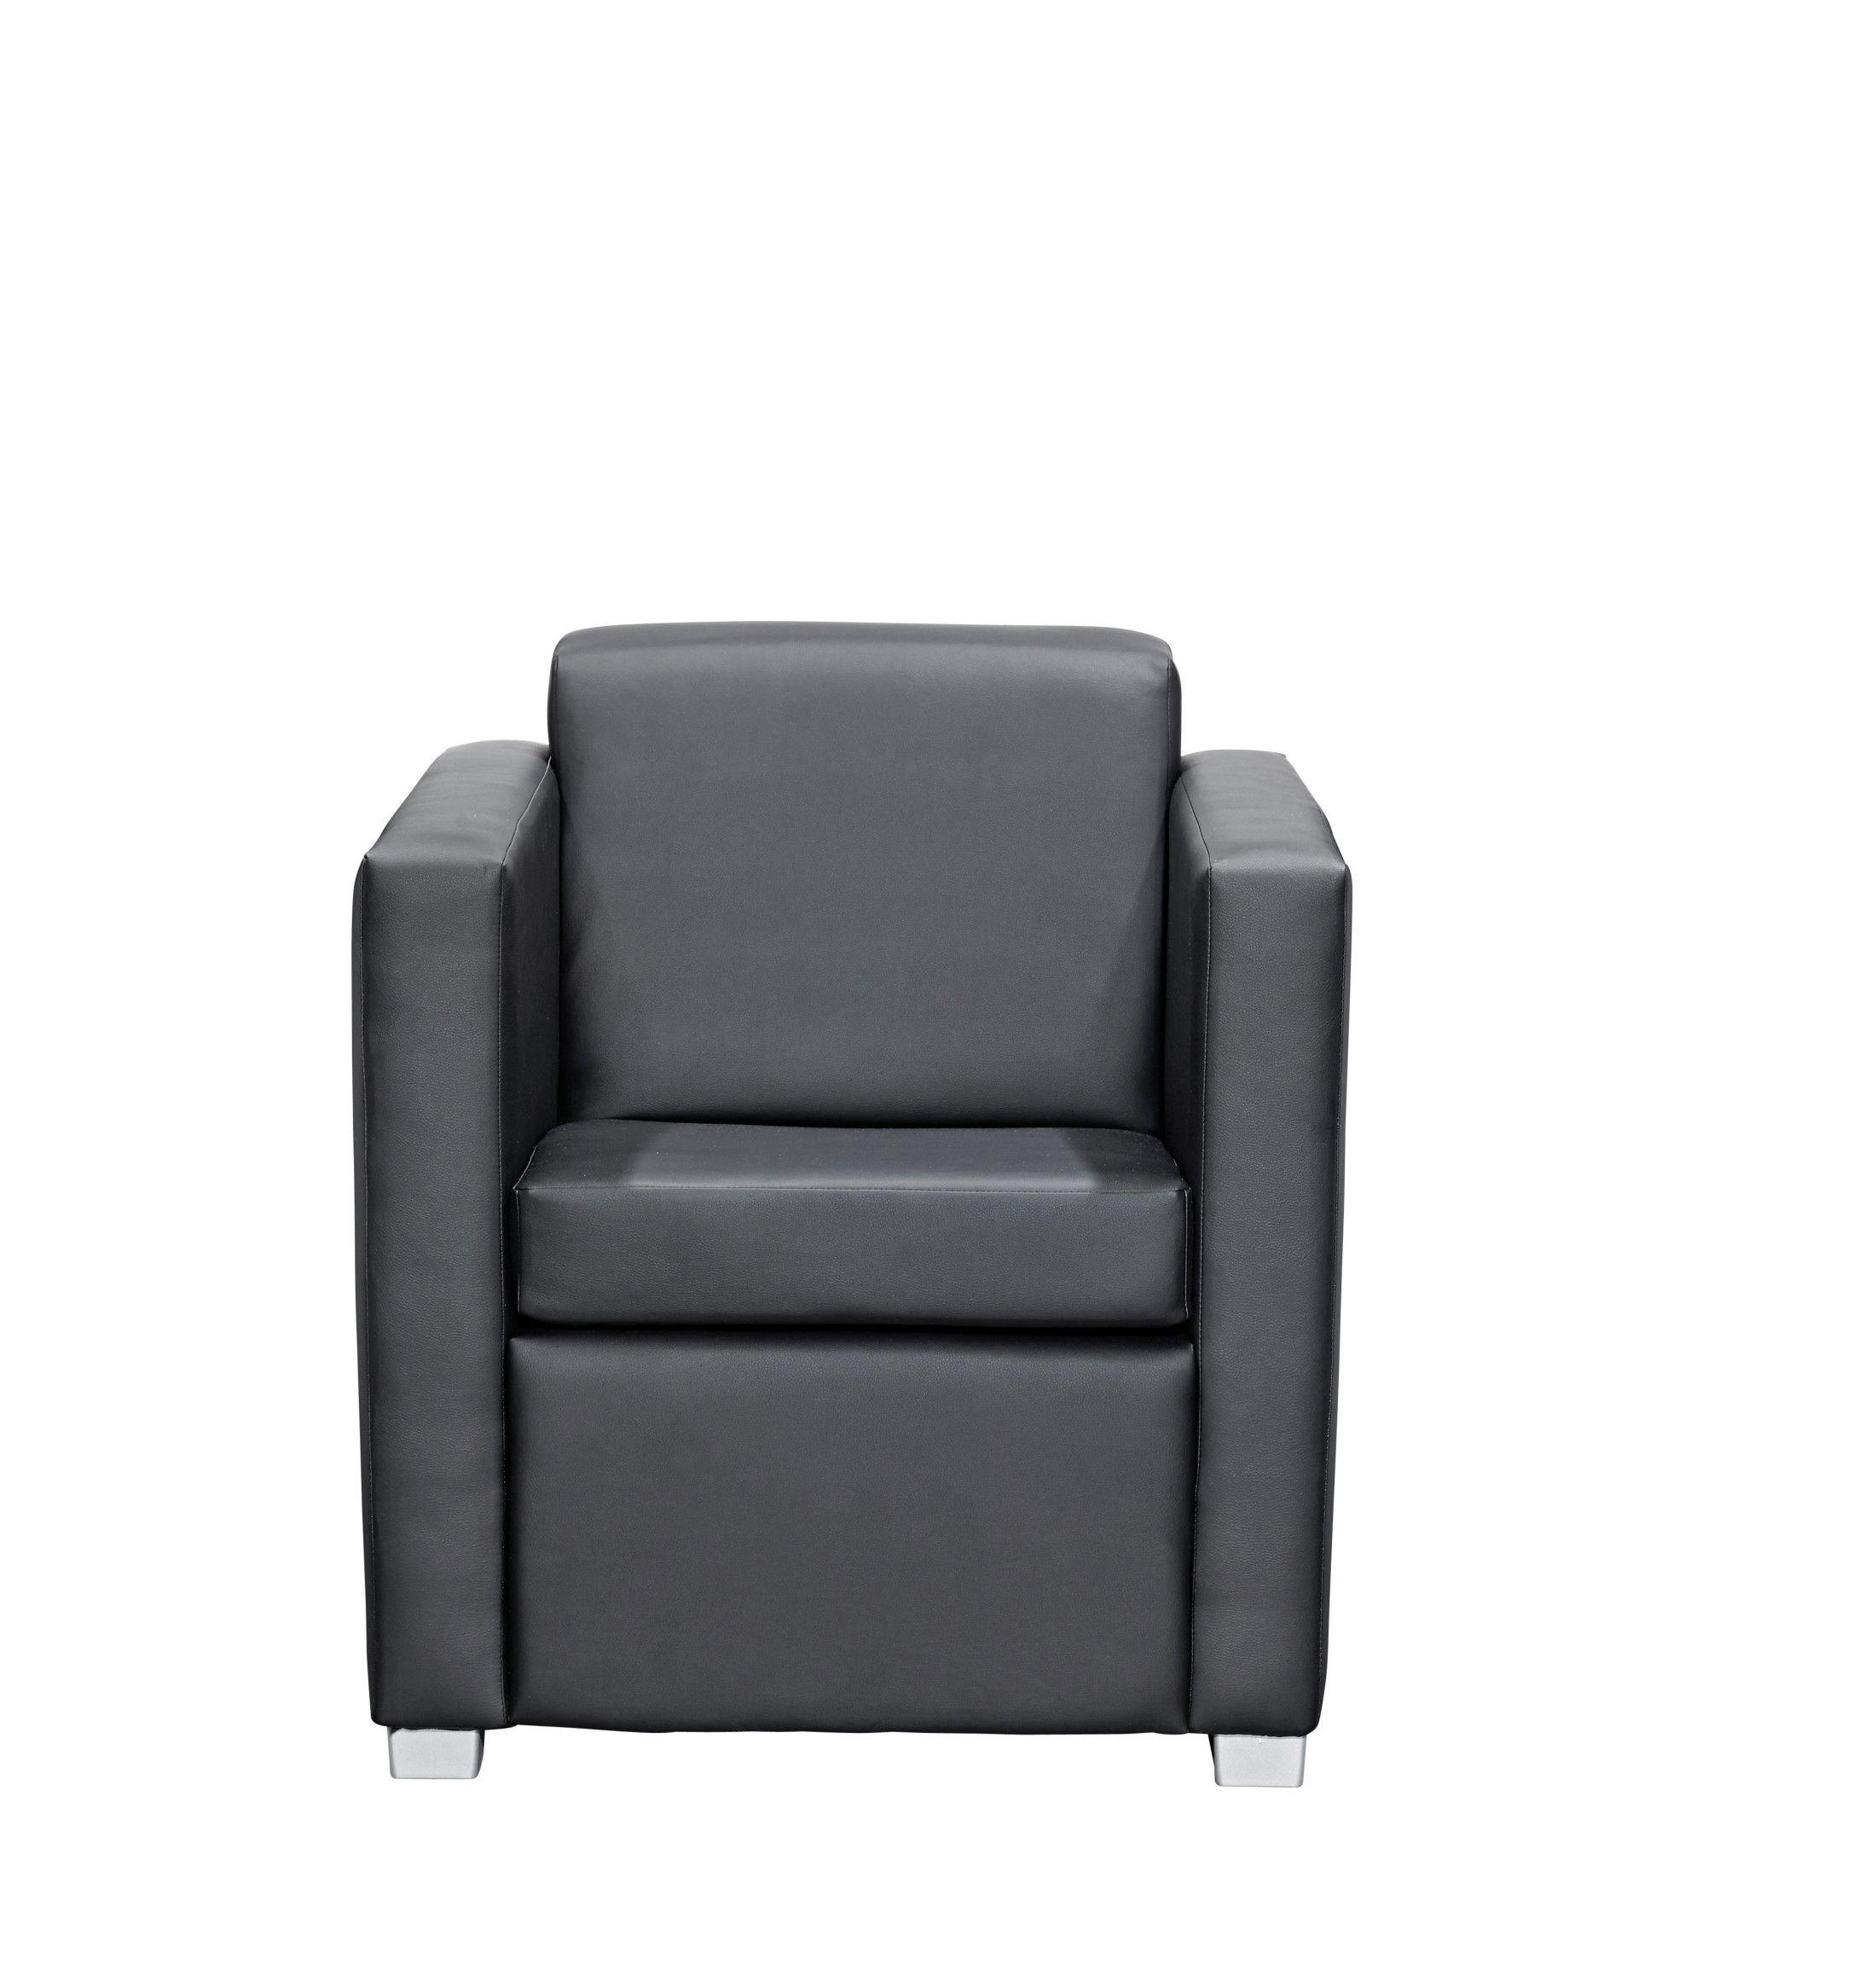 Sessel Kunstleder Black Woody 118 00234 Schwarz Modern Jetzt Bestellen Unter Https Moebel Ladendirekt De Kueche Und Es Esszimmerstühle Sessel Sessel Günstig